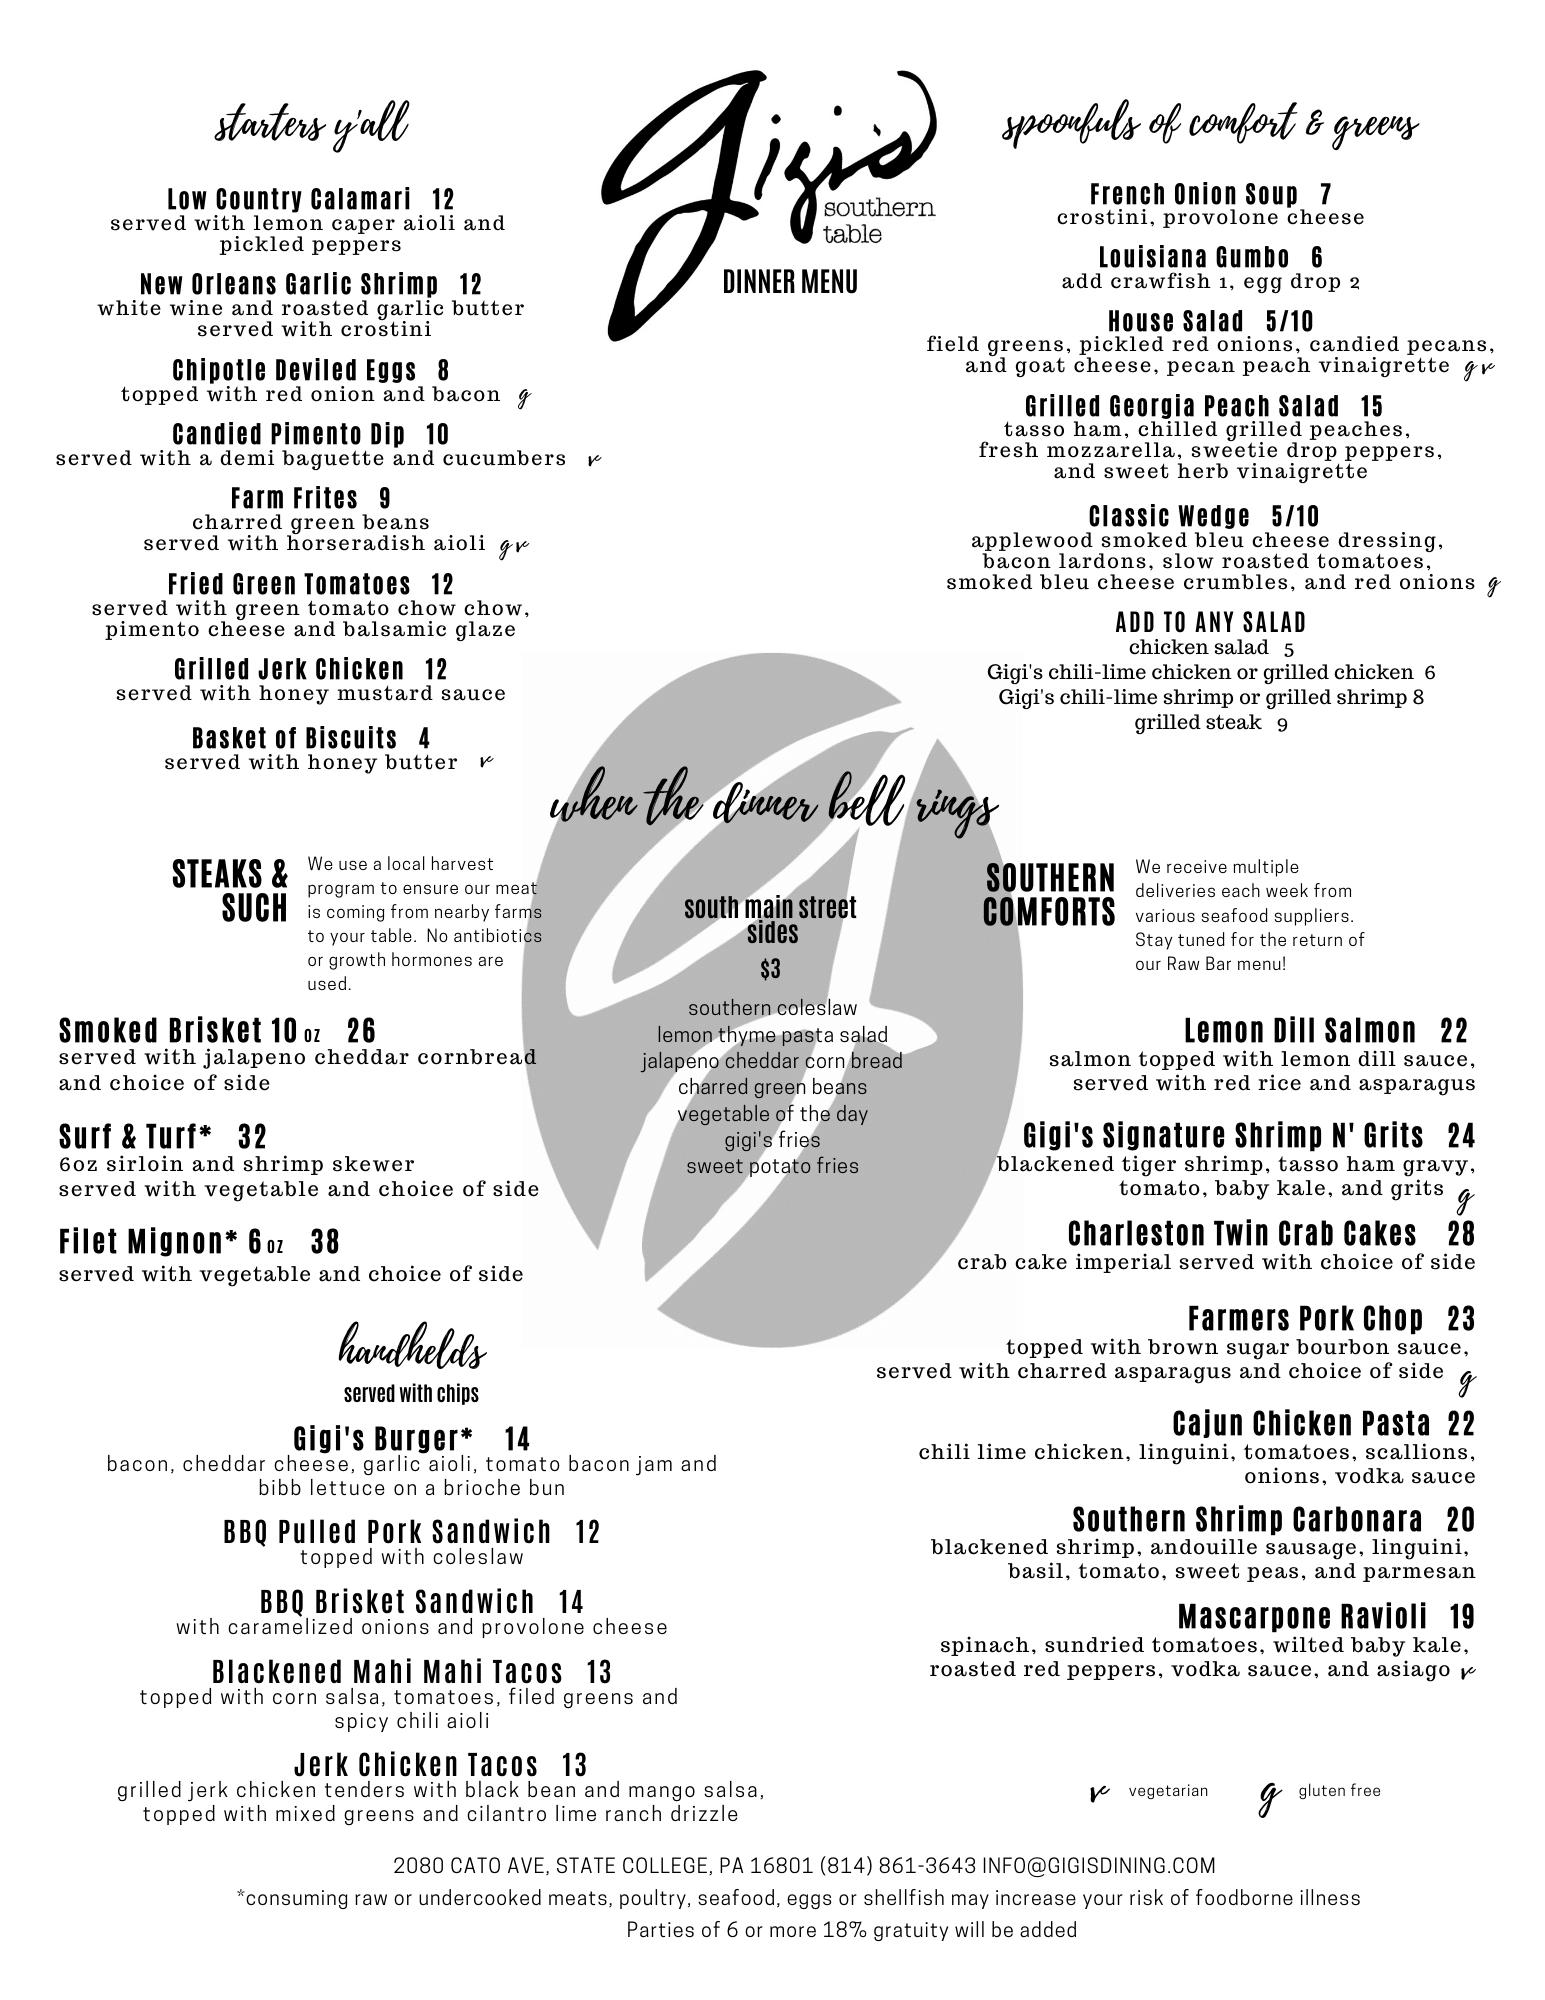 Gigi's dinner menu